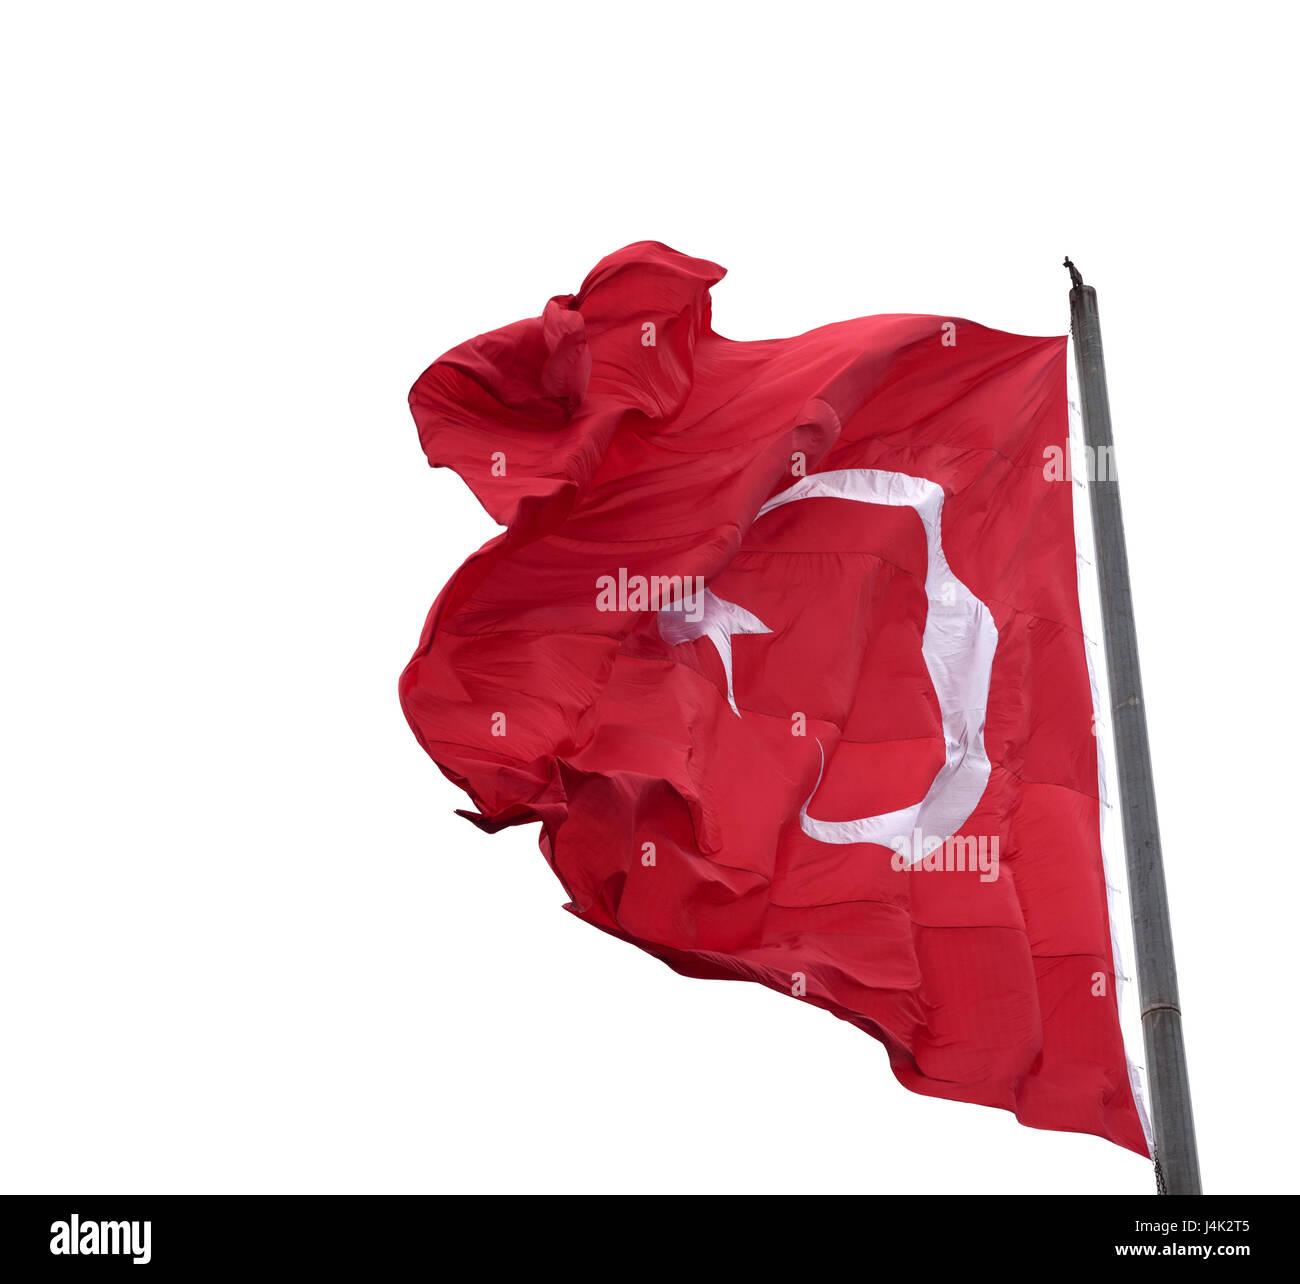 Waving in wind flag of Turkey on flagpole. Isolated on white background. - Stock Image